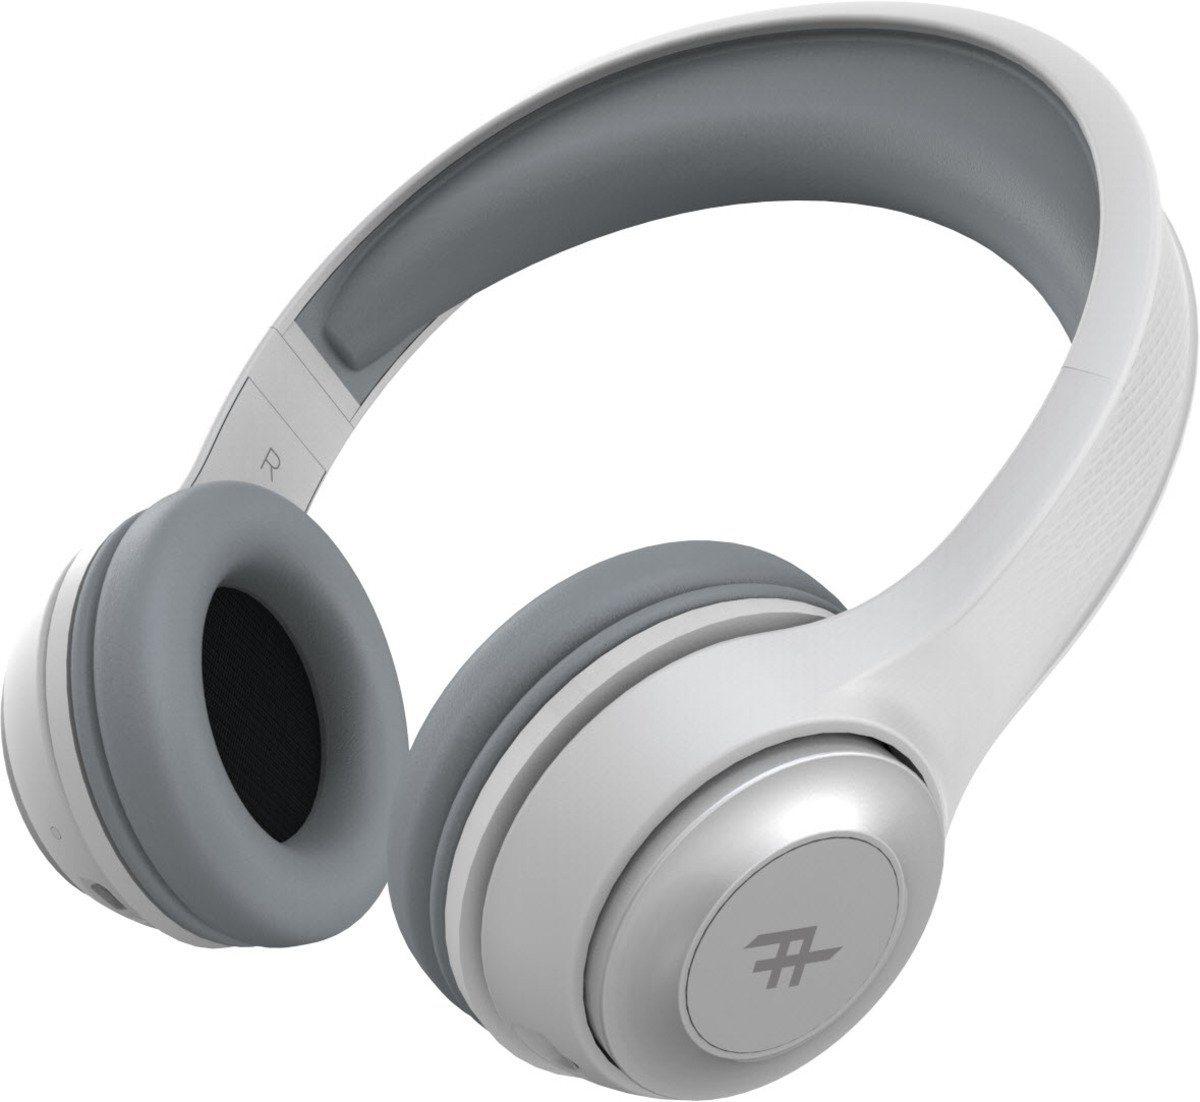 Headset »Aurora Wireless Headphones«